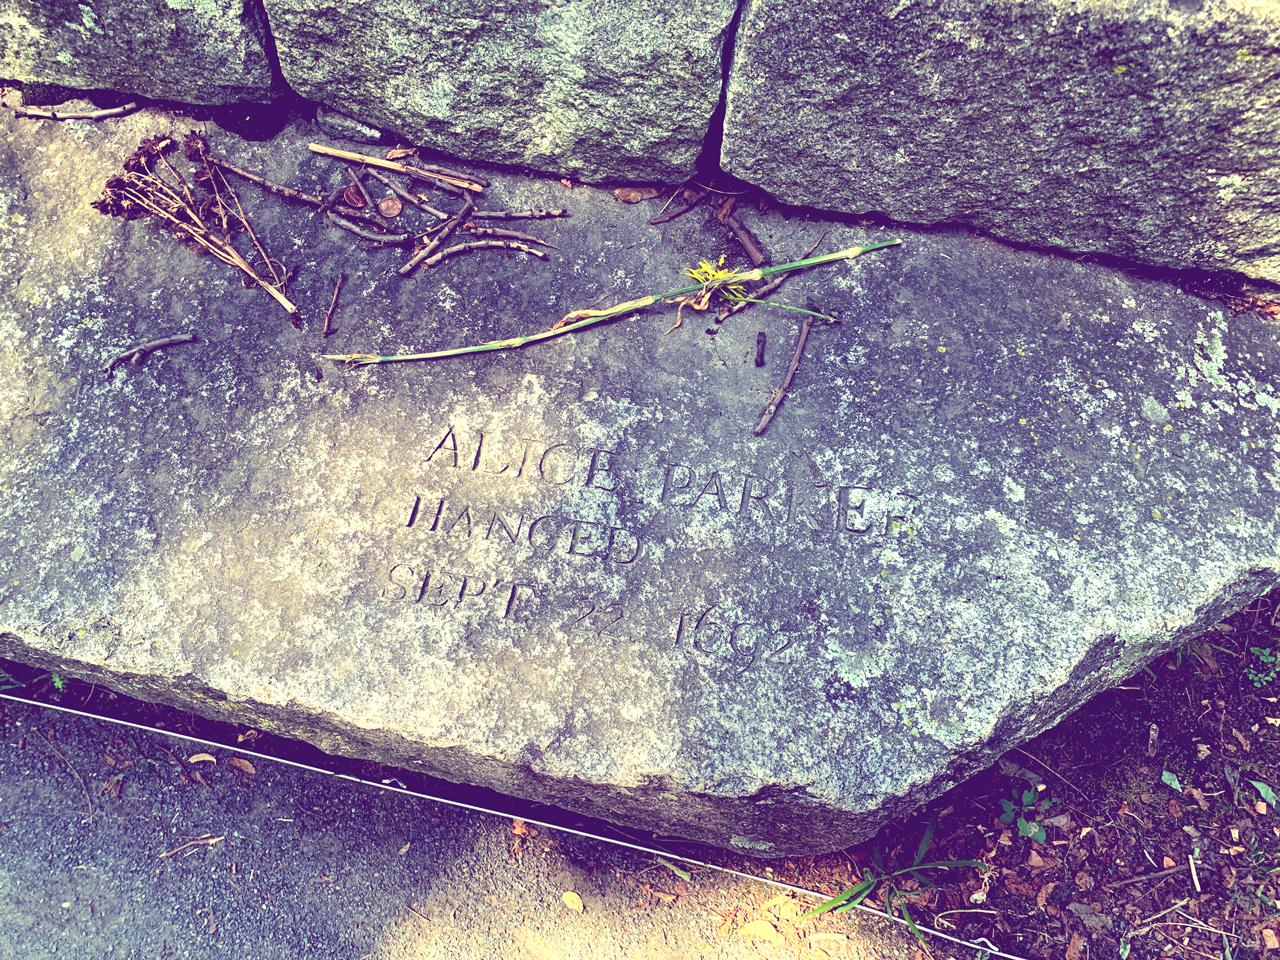 salem-witch-trials-memorial-massachusetts-alice-parker-1280x960